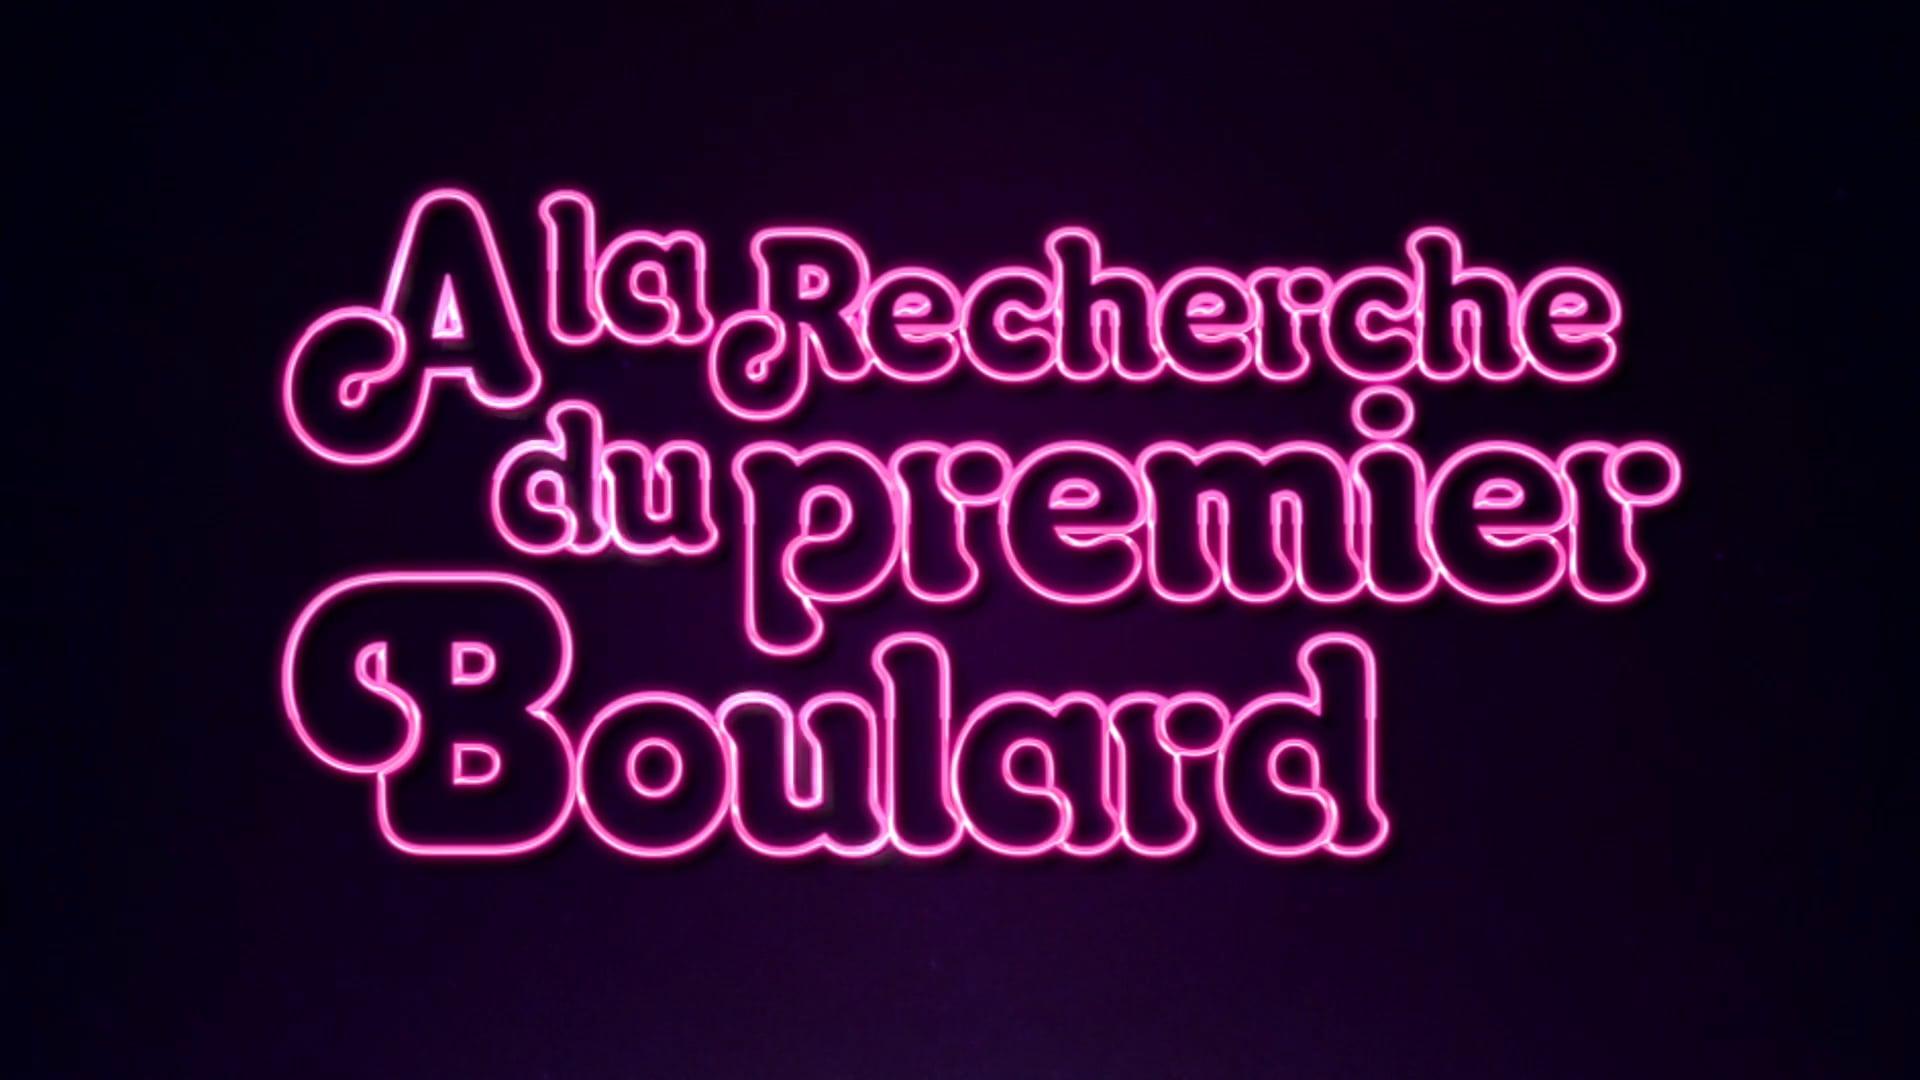 A la recherche du premier Boulard - TRAILER